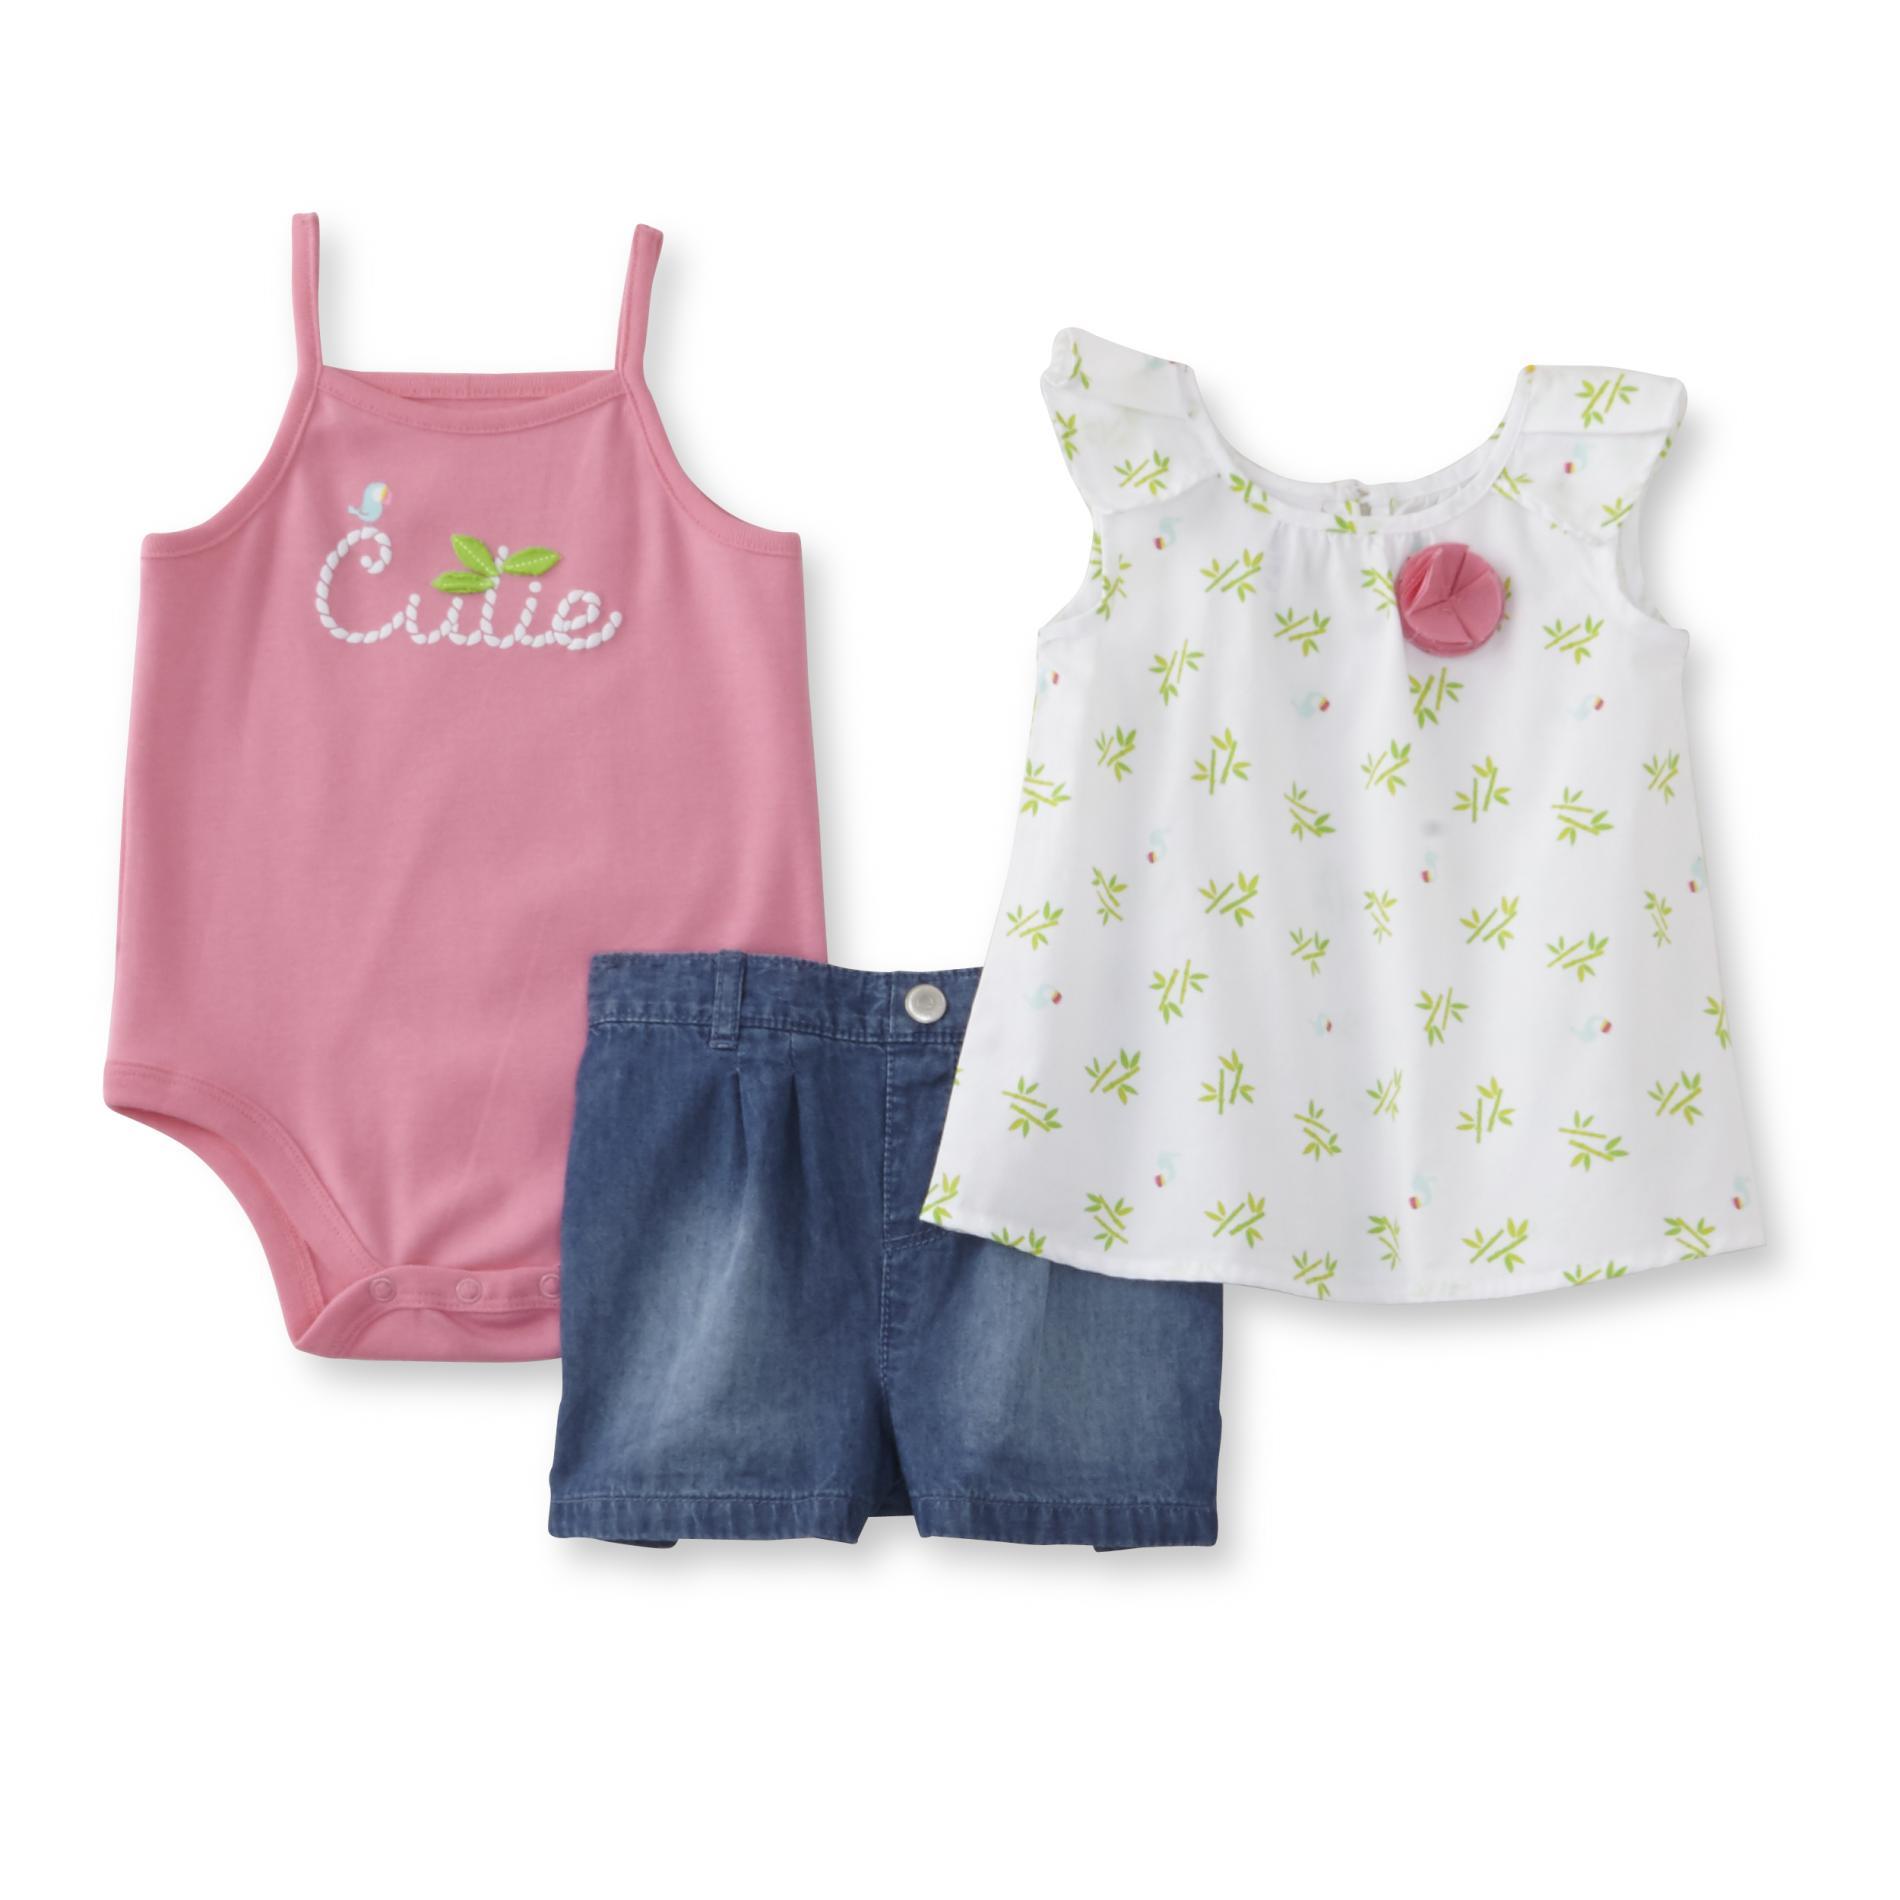 Little Wonders Newborn Girl's Bodysuit, Tunic & Shorts - Cutie